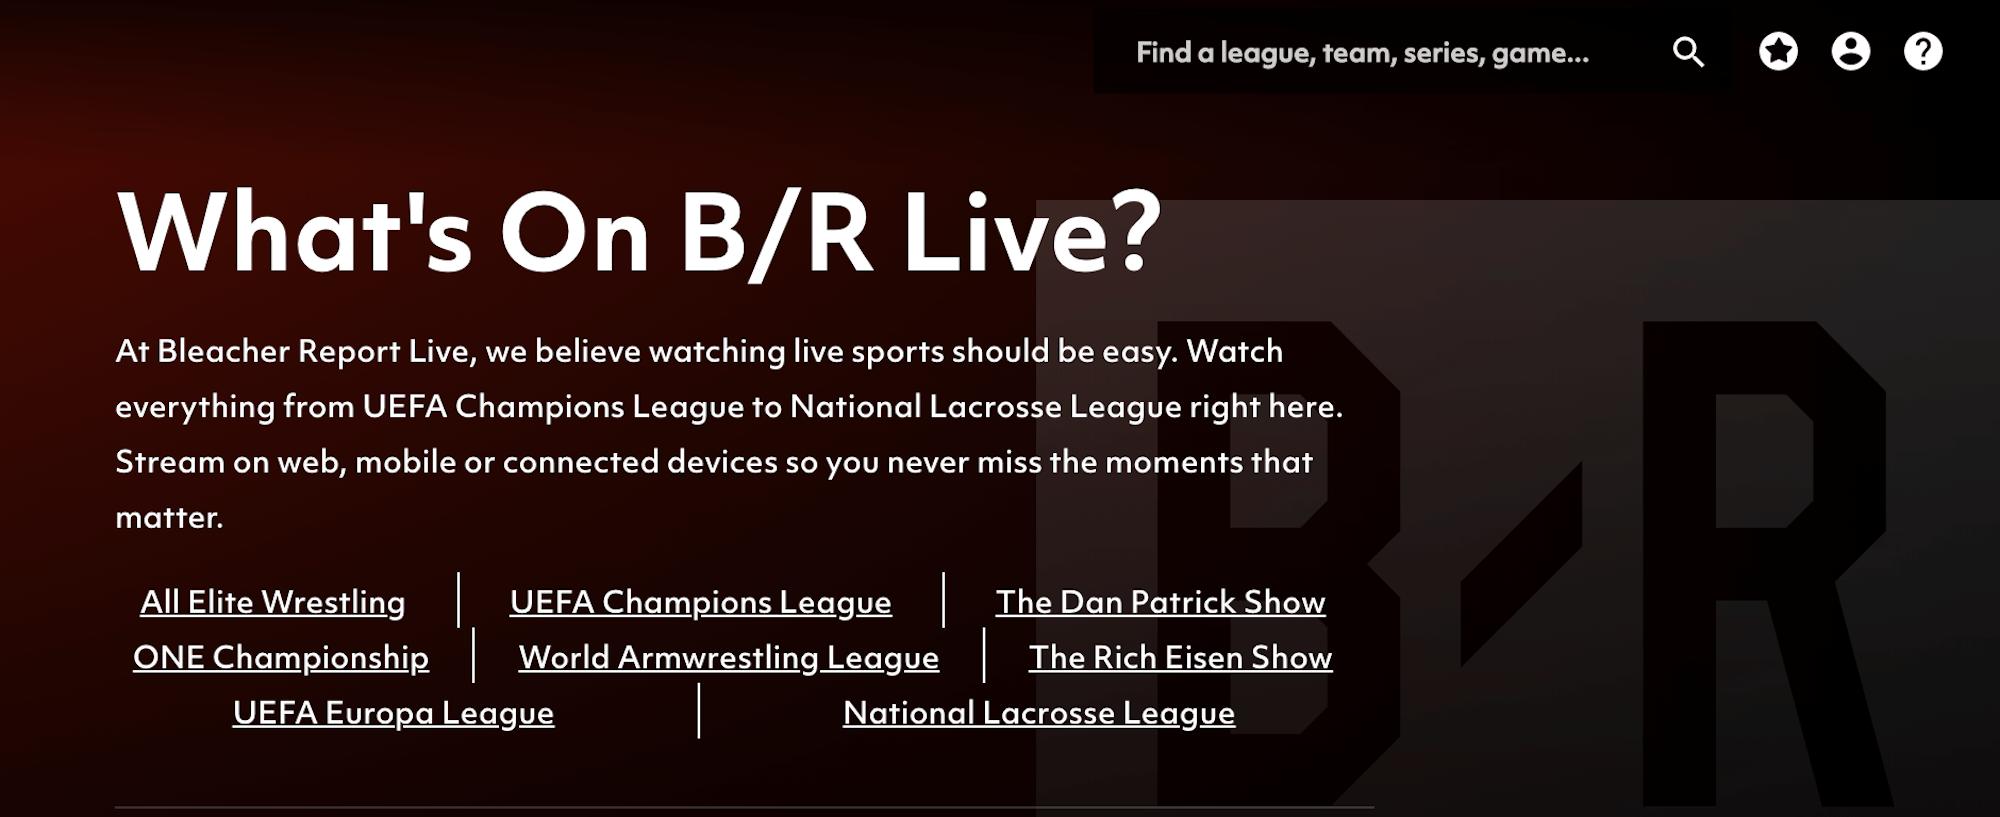 2019-20-uefa champions league chelsea vs lille soccer live stream free b-r live